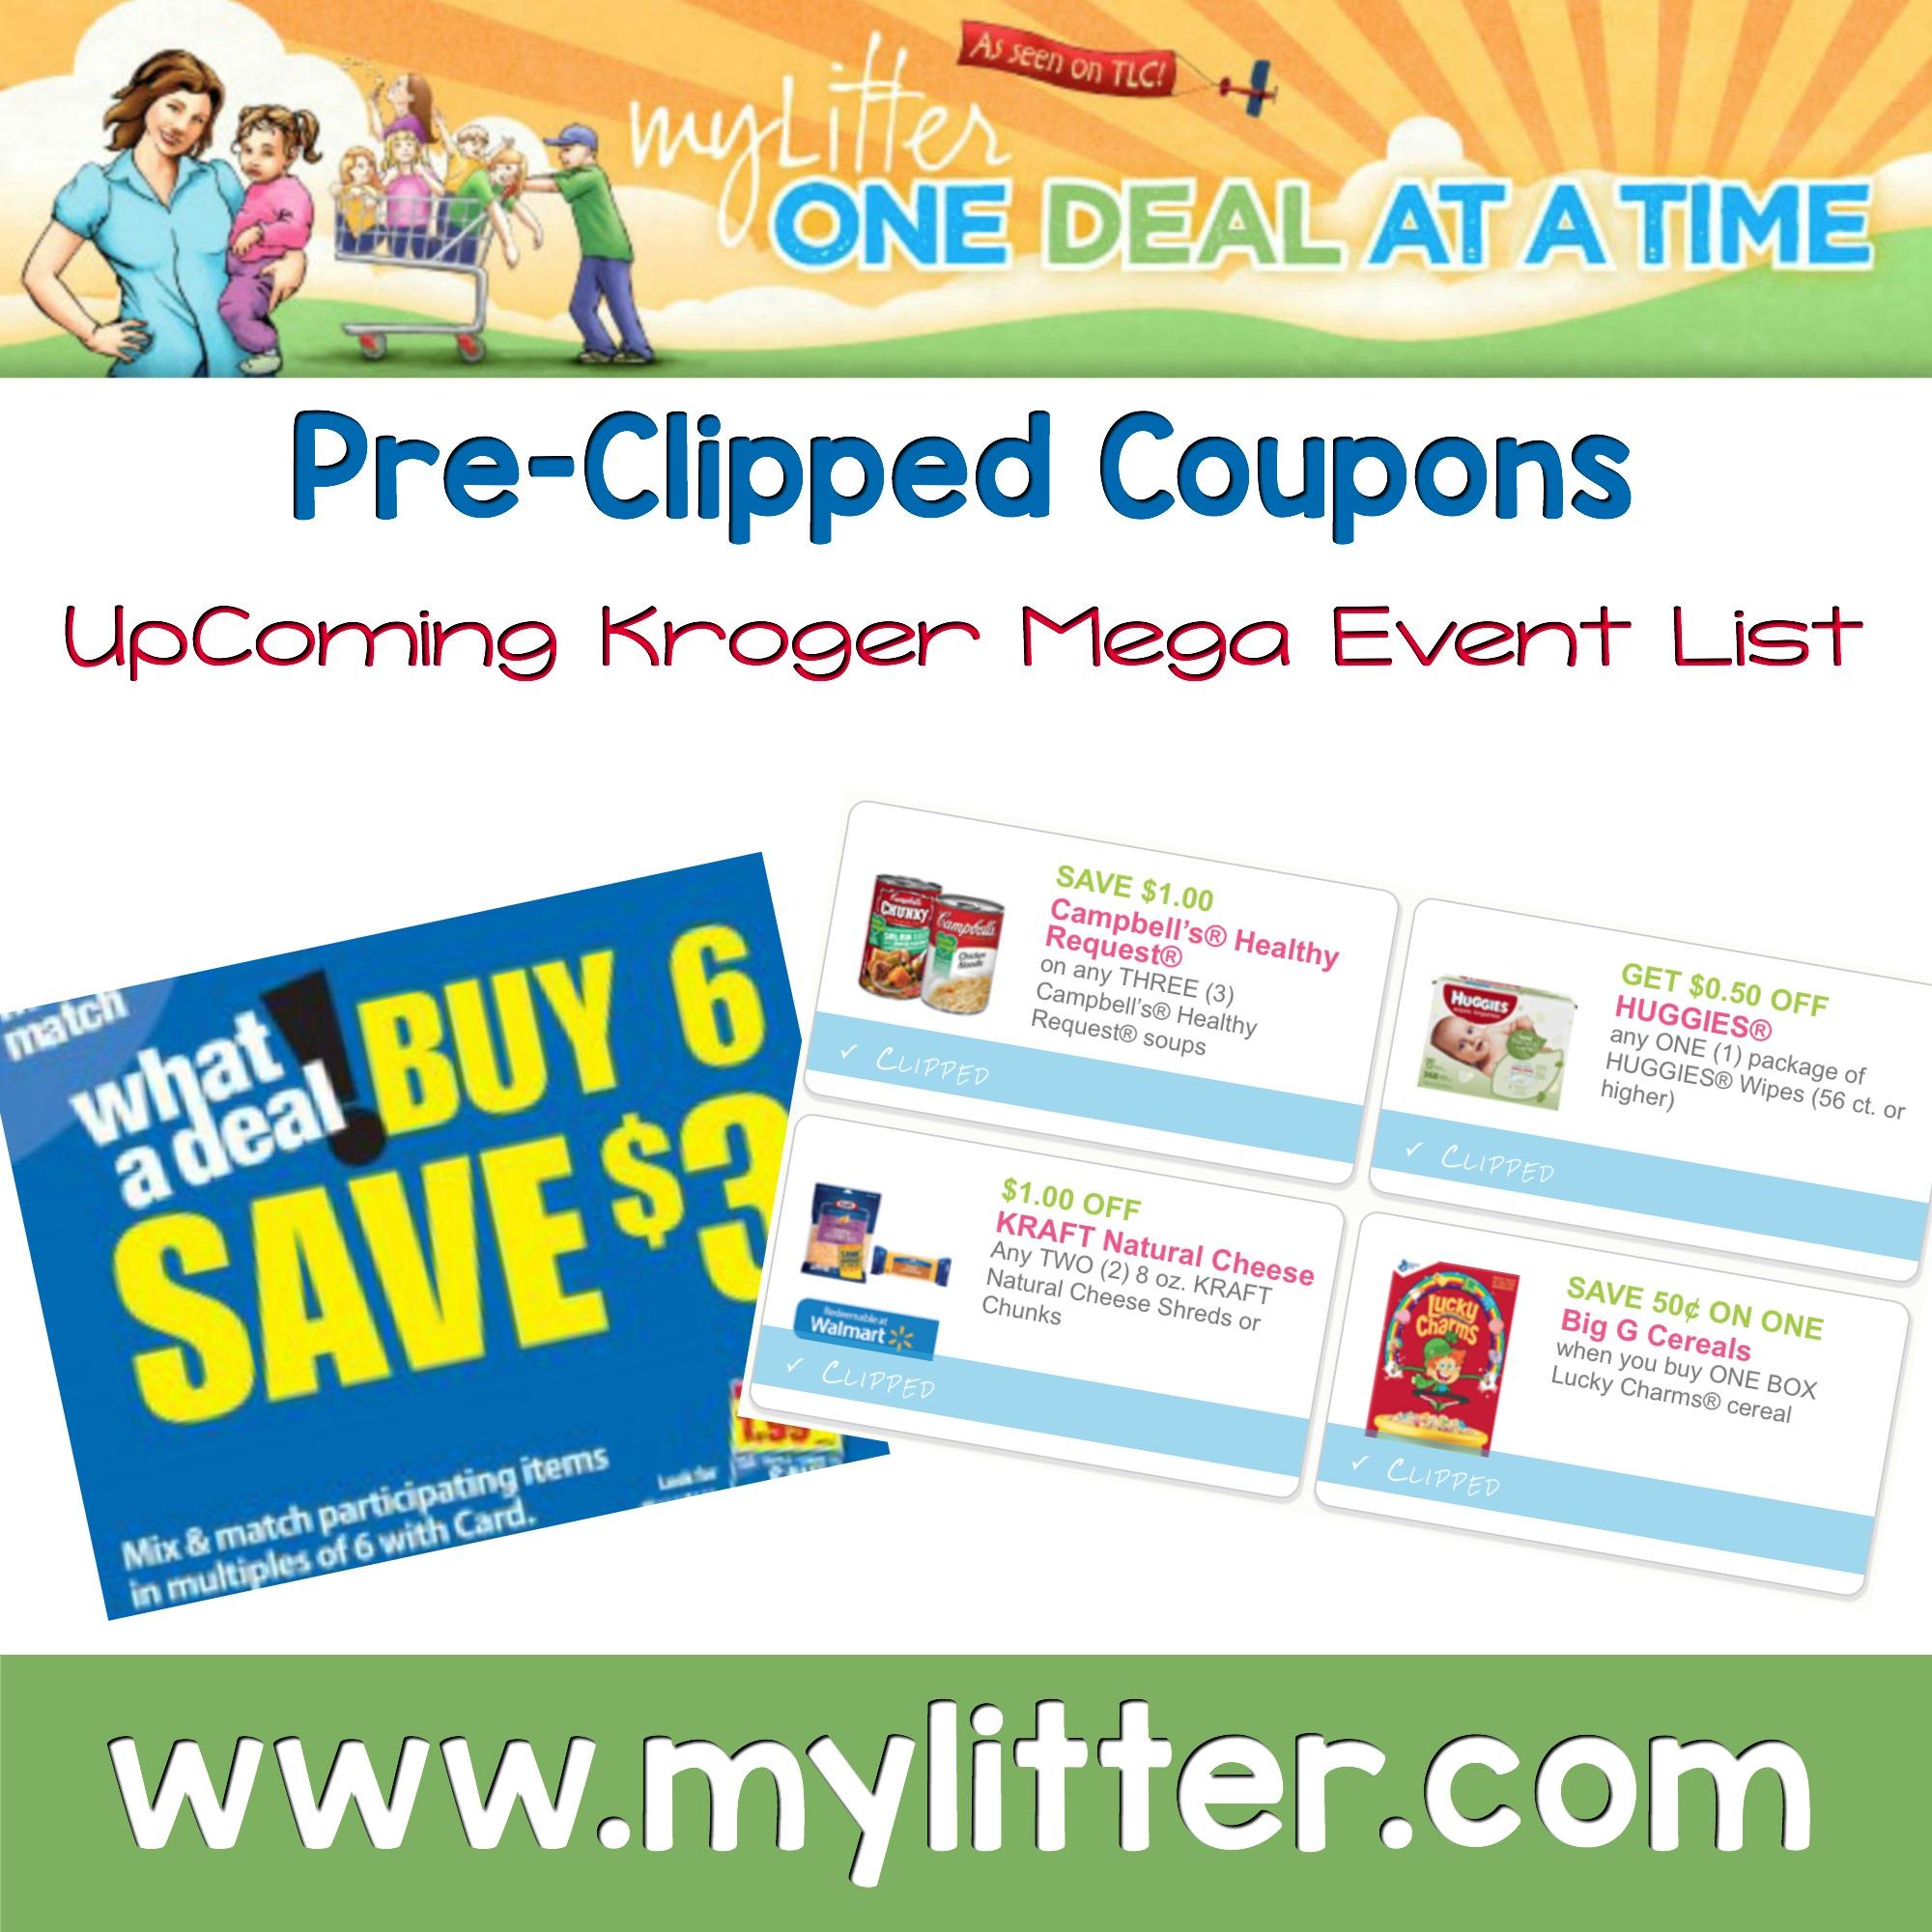 Kroger pharmacy coupon printable - Alamo rental car coupon